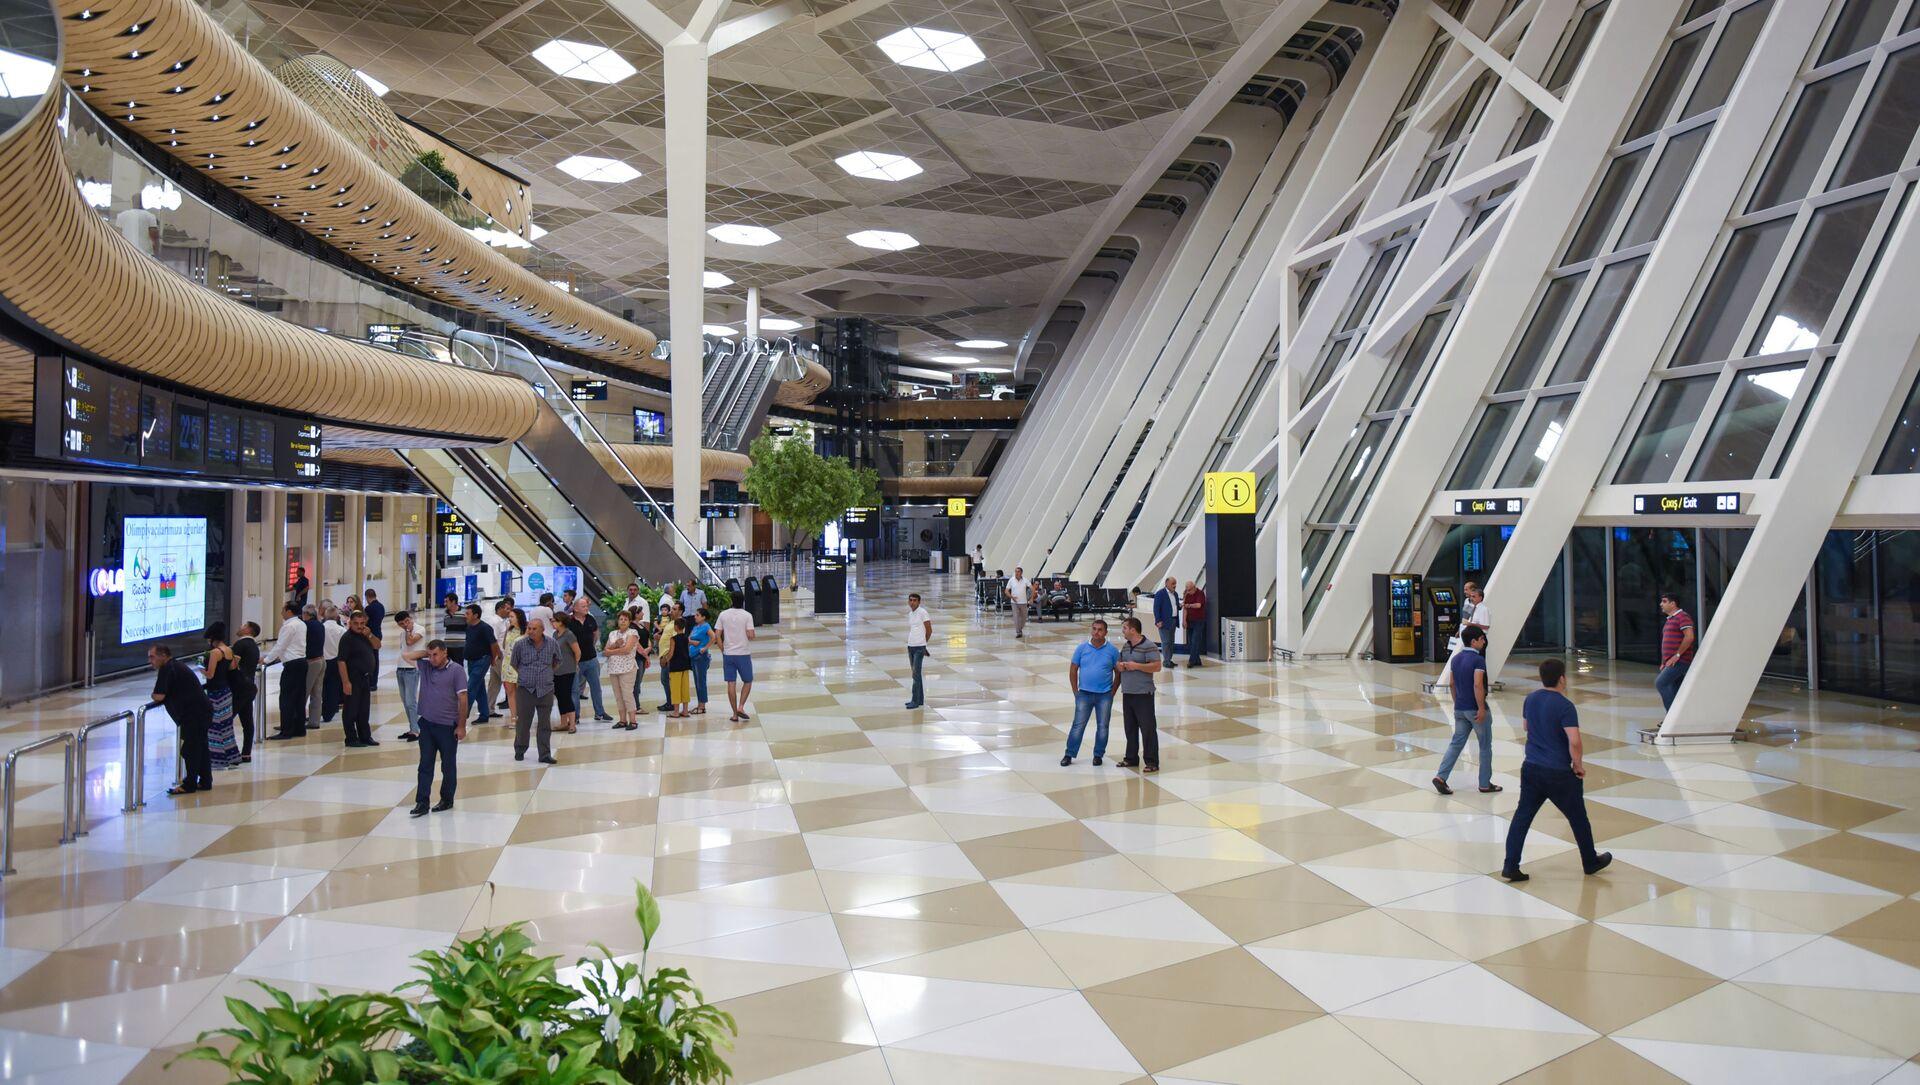 Вестибюль Международного аэропорта имени Гейдара Алиева в Баку - Sputnik Azərbaycan, 1920, 21.05.2021